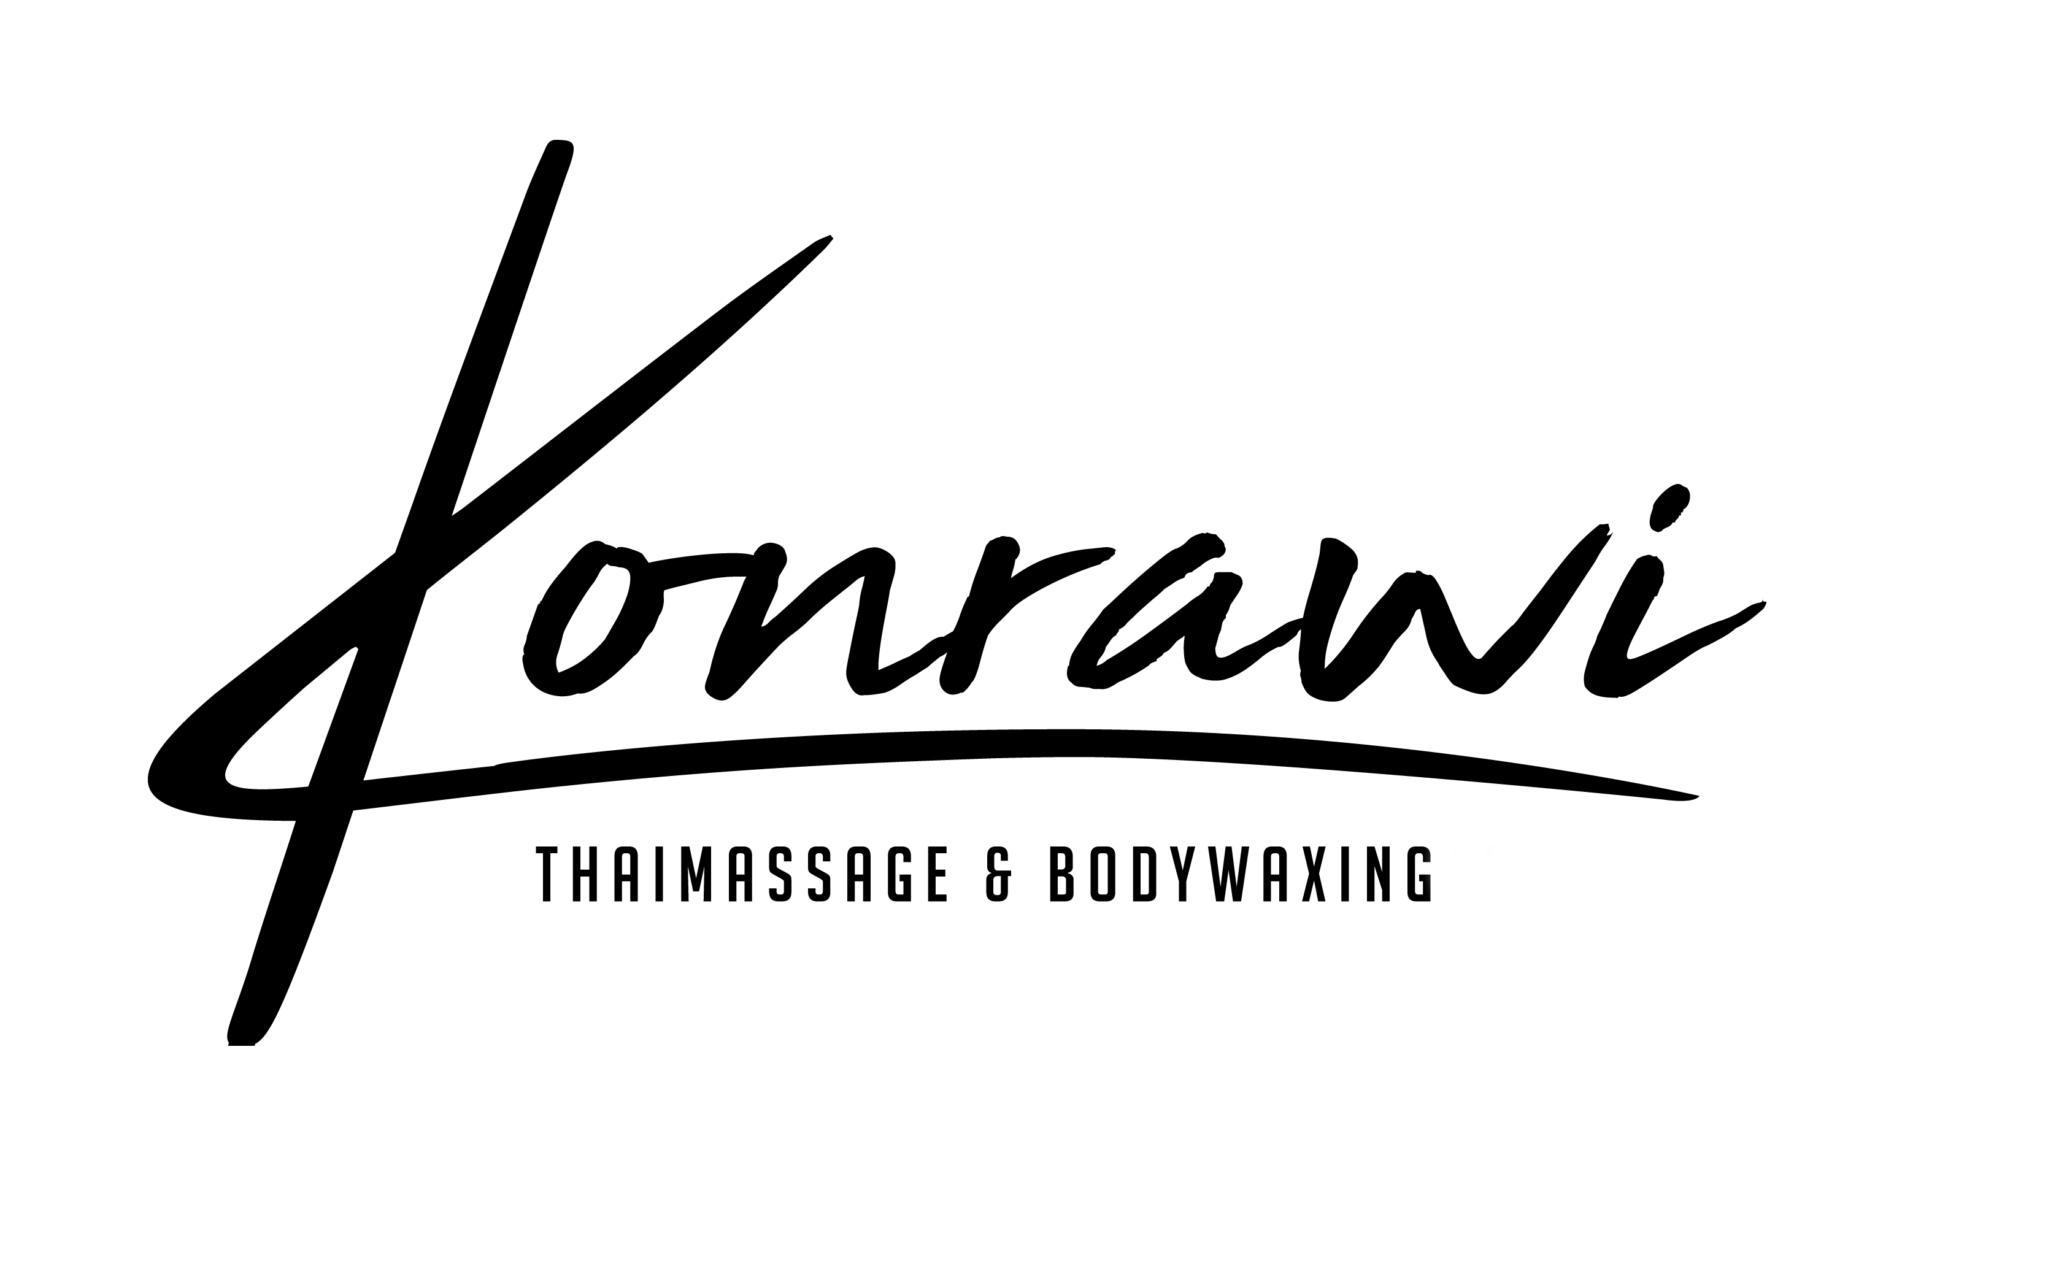 Konrawi Thaimassage & Bodywaxing